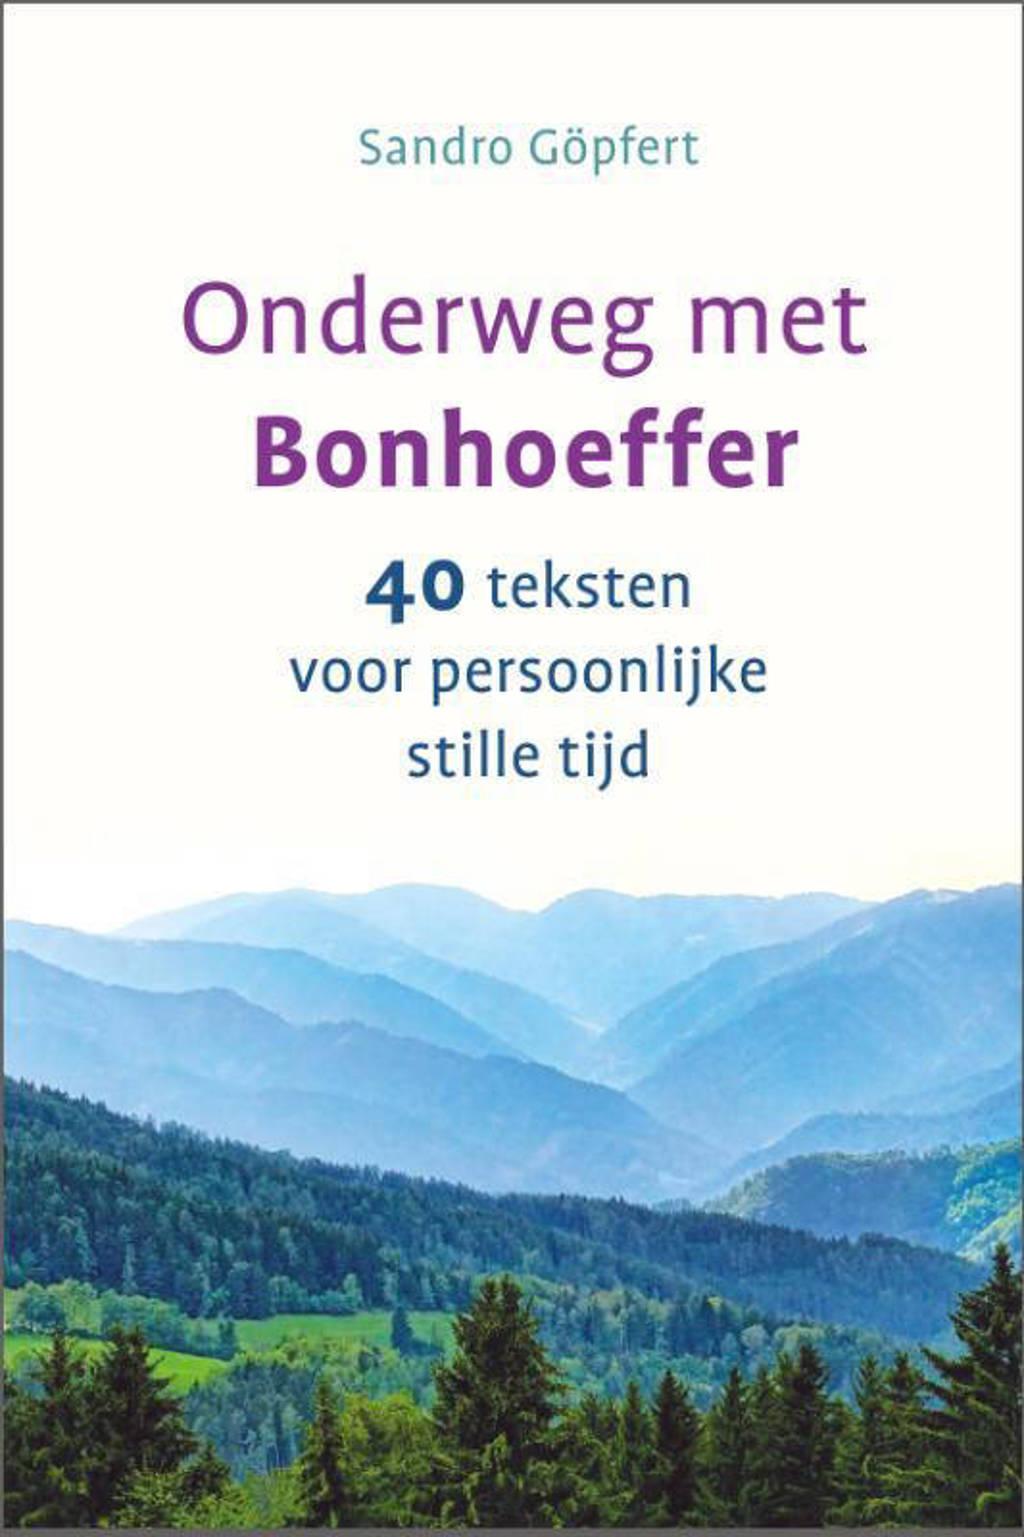 Onderweg met Bonhoeffer - Sandro Göpfert